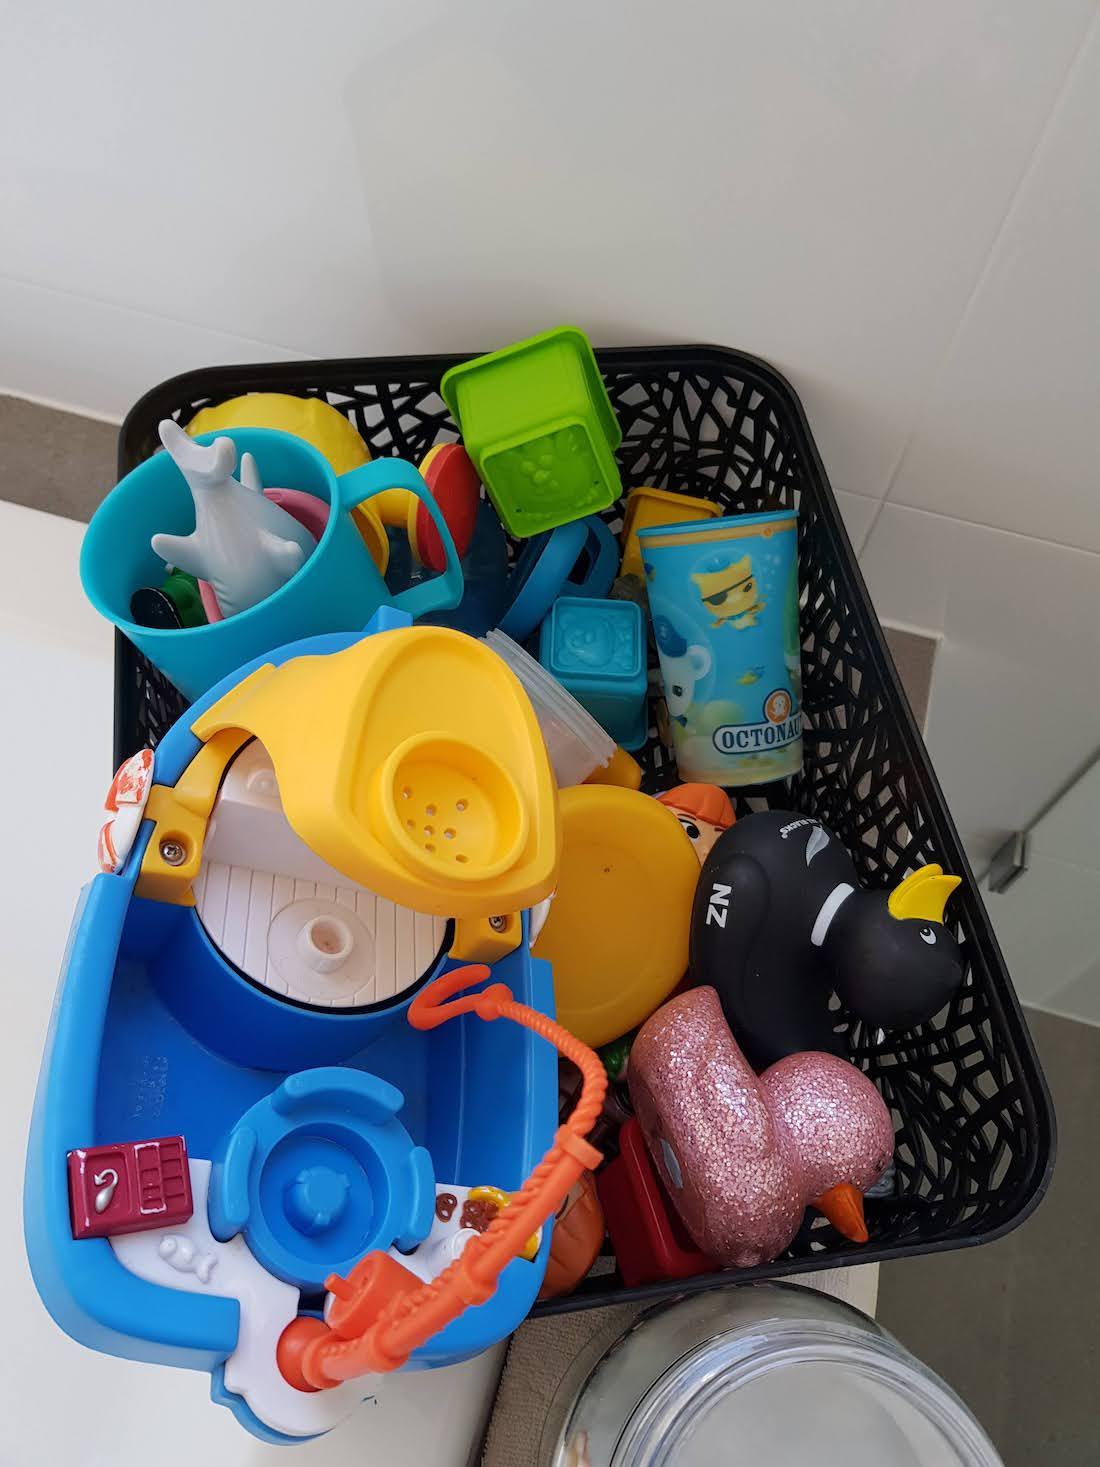 Black mosaic Kmart basket for toy storage